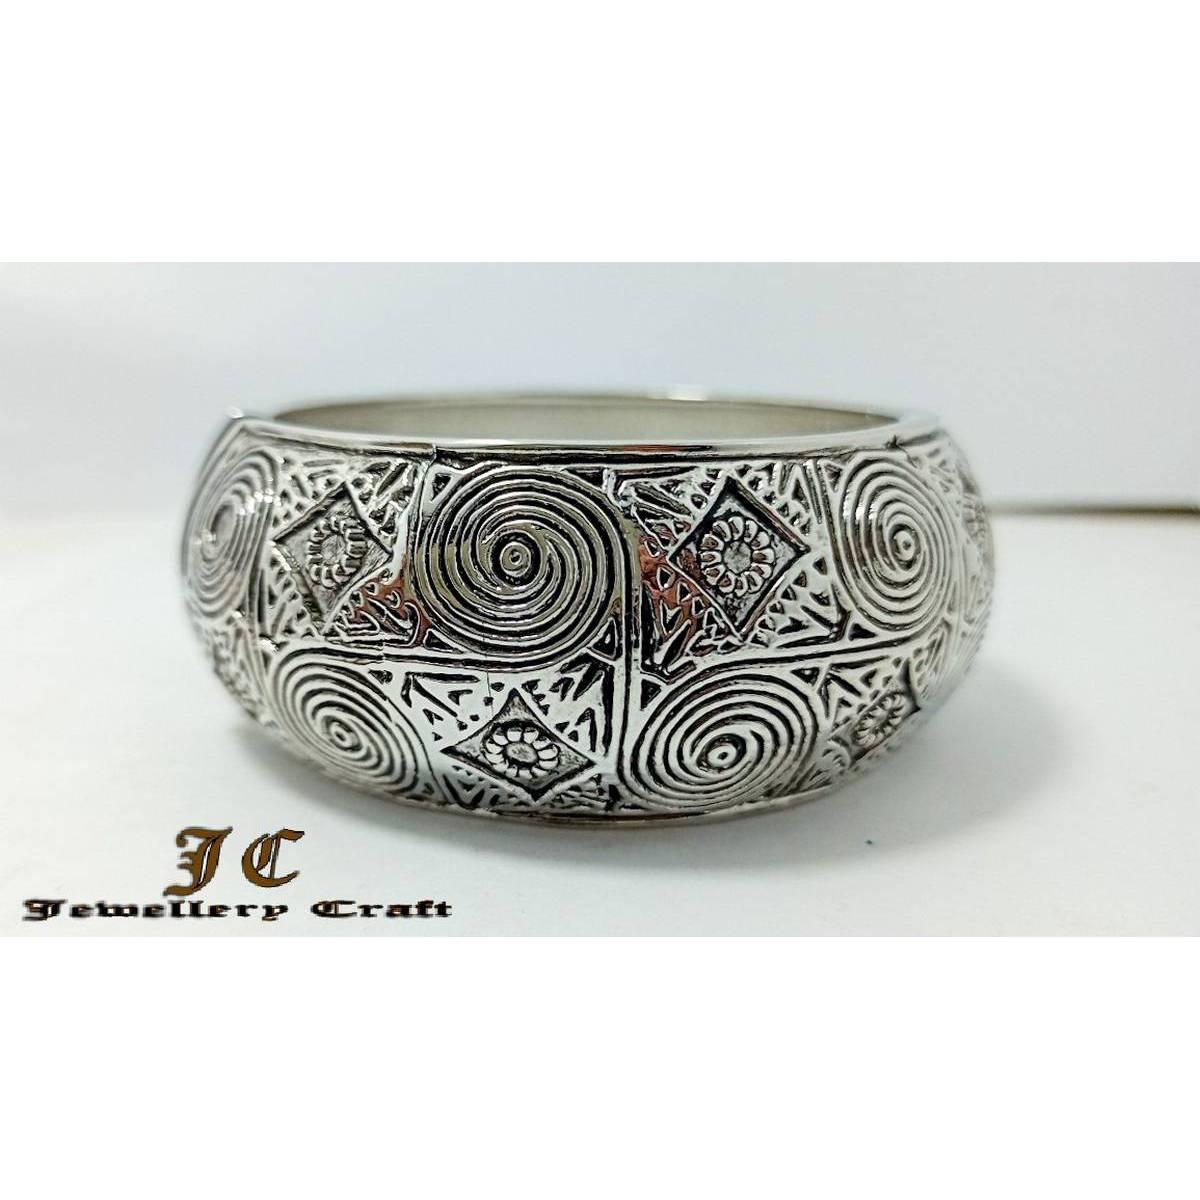 Antique Bangles Bracelet Clip On Silver --Jewellery Craft--